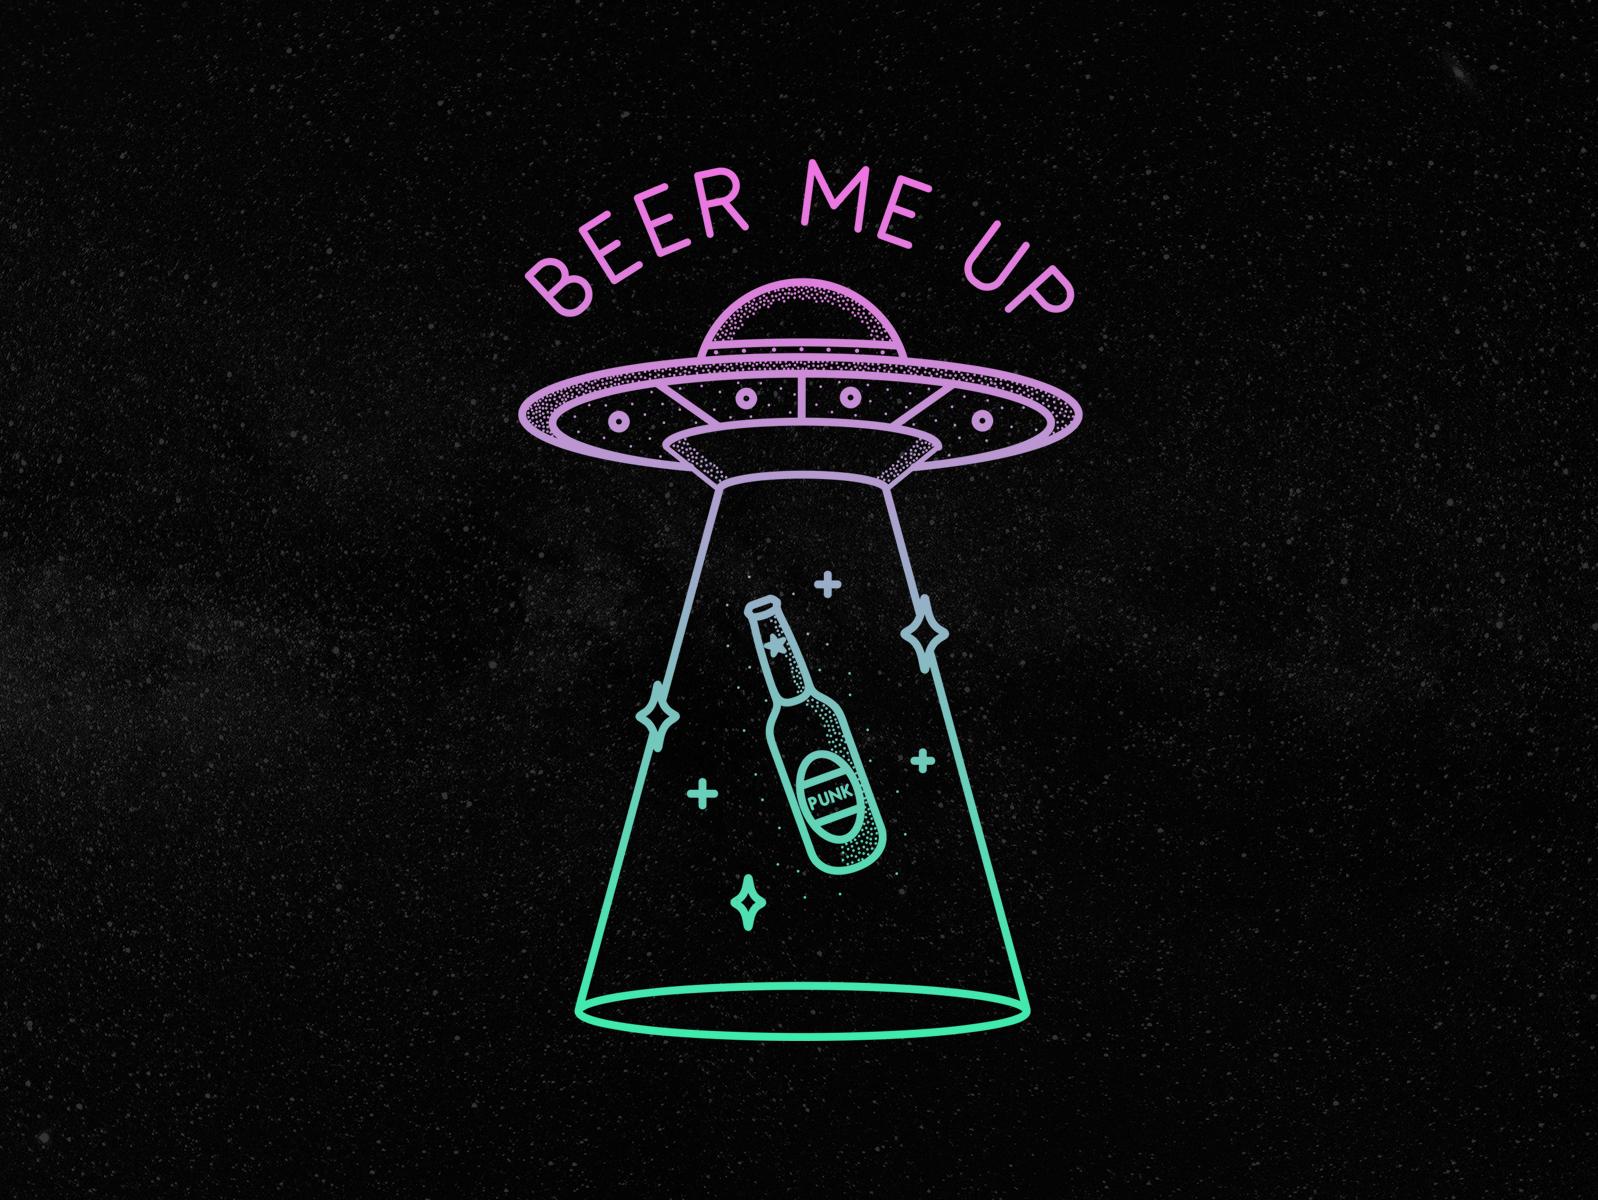 Beer Me Up 🛸🍺 spaceship space martian alien design branding badge identity logo design logo flash tattoo illustration dotwork flying saucer conspiracy alcohol beer aliens ufo